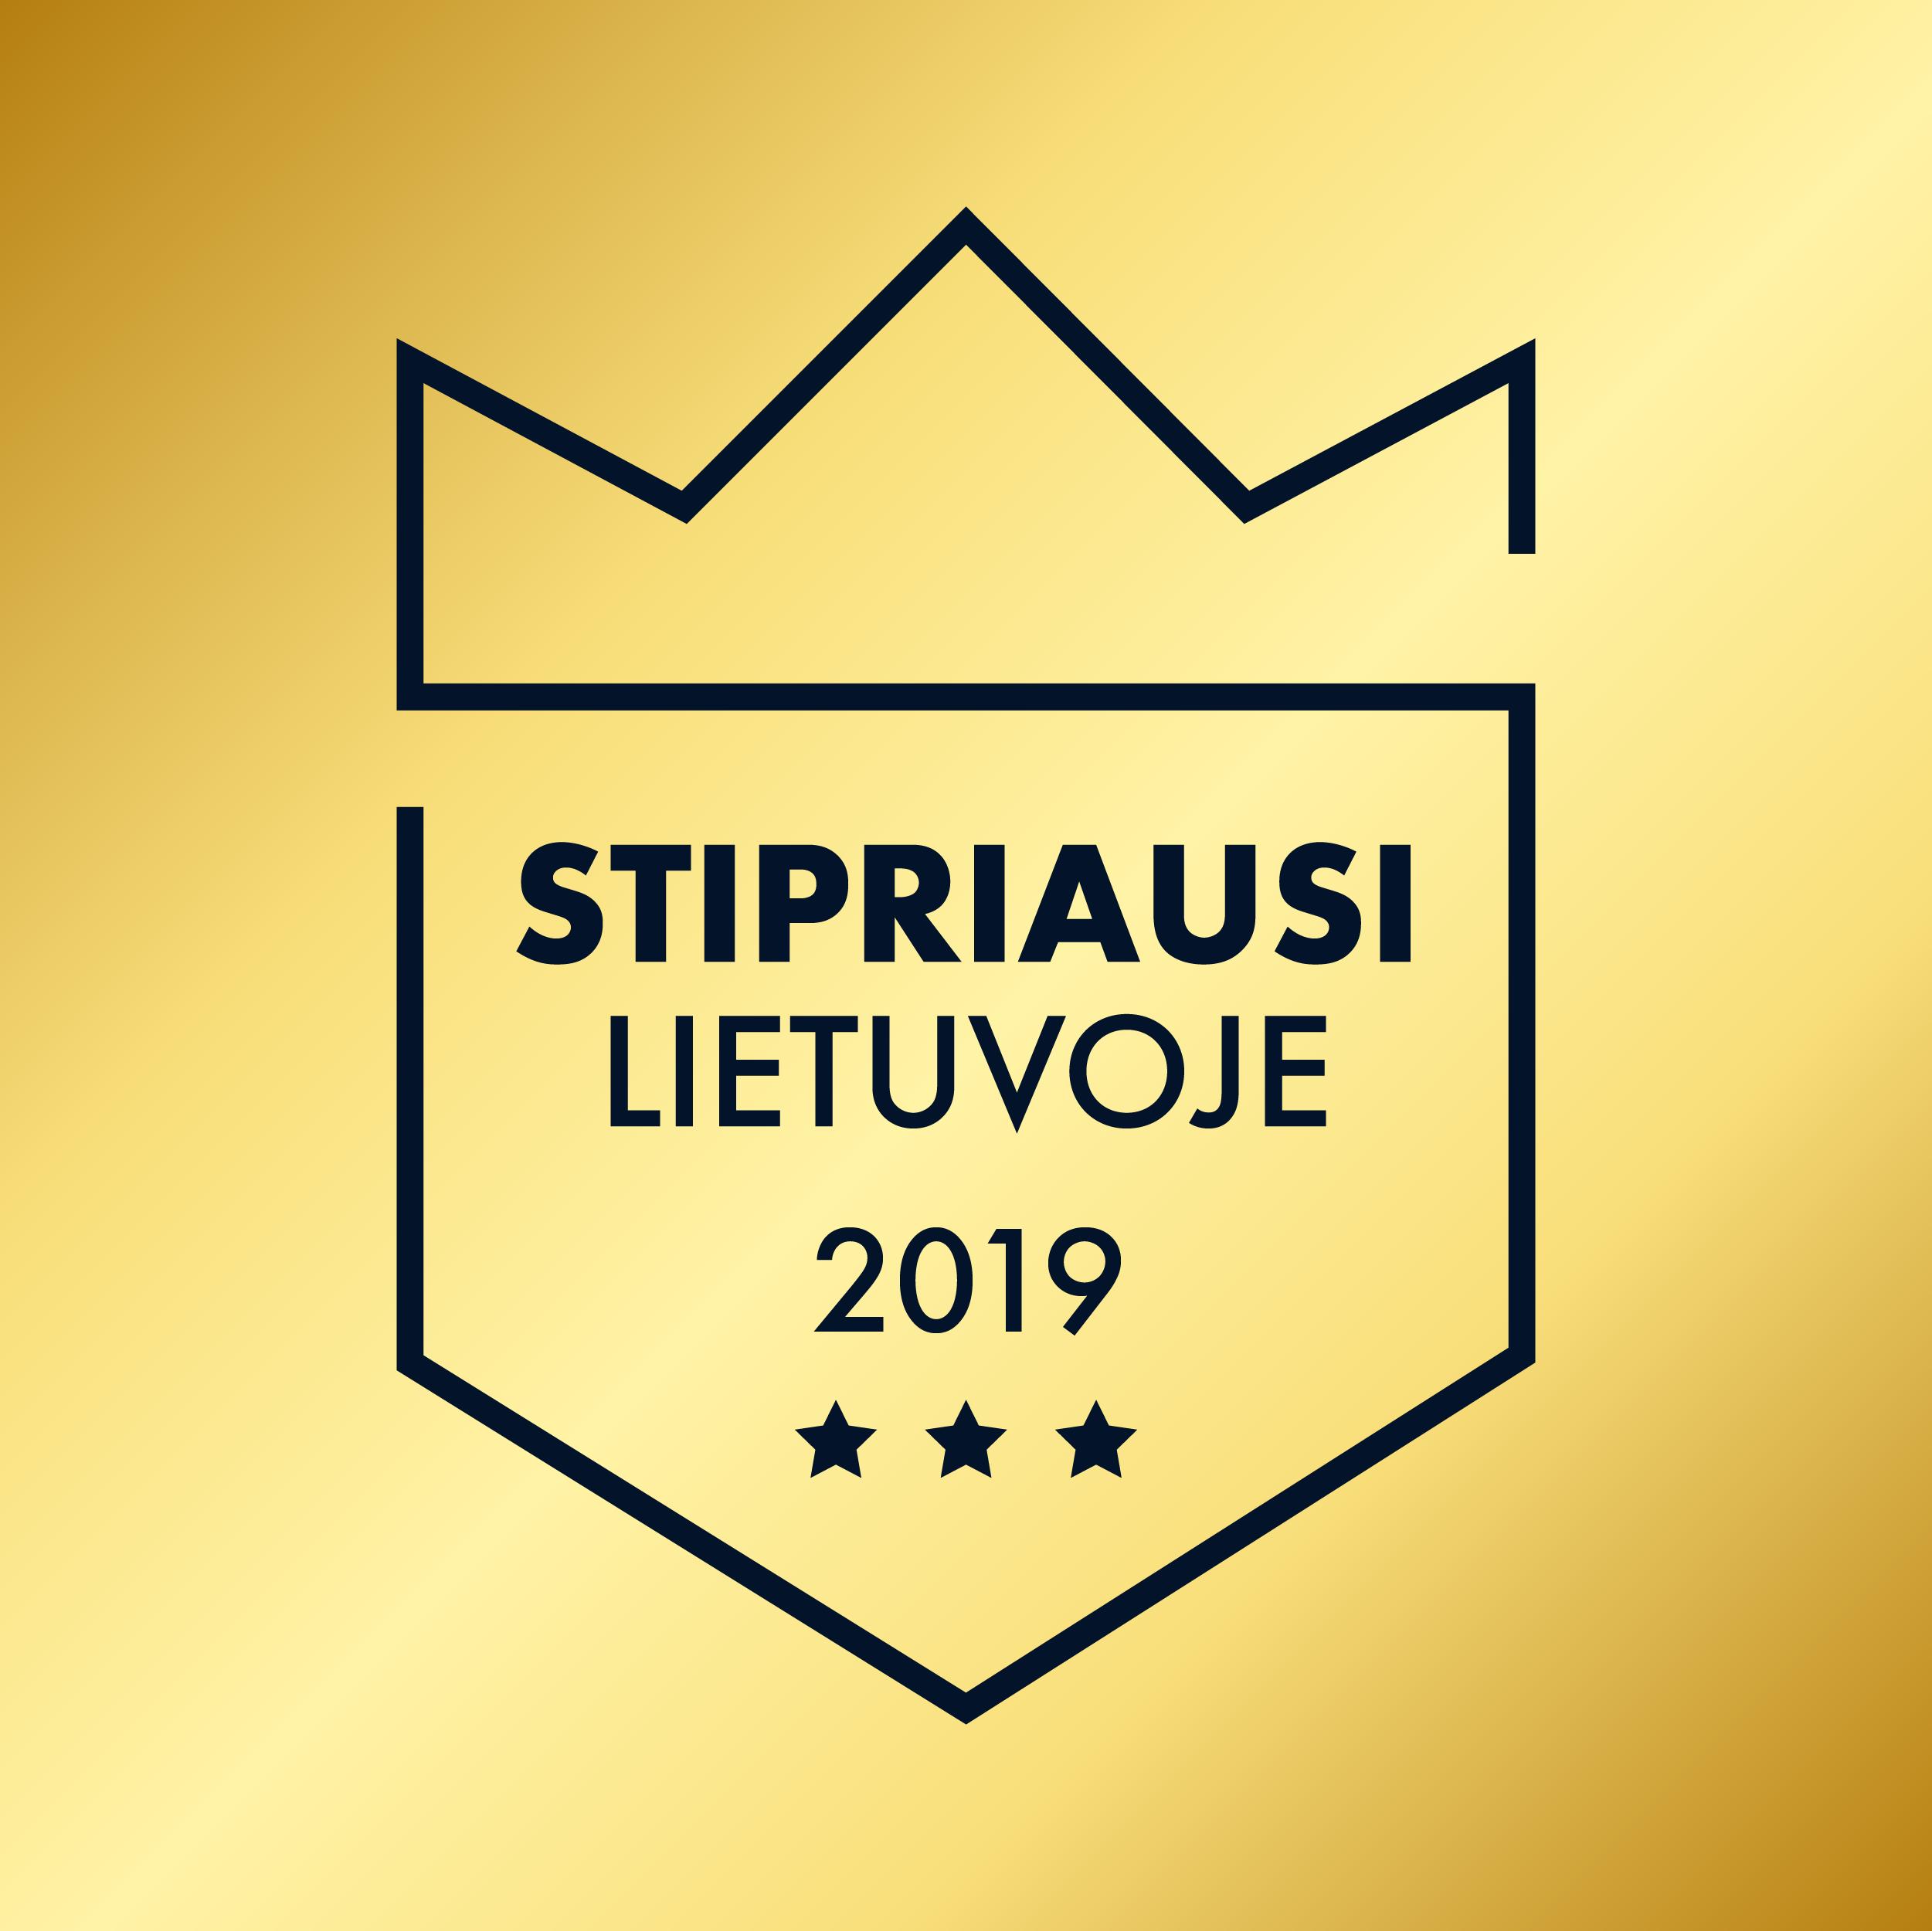 Stipriausi Lietuvoje 2019